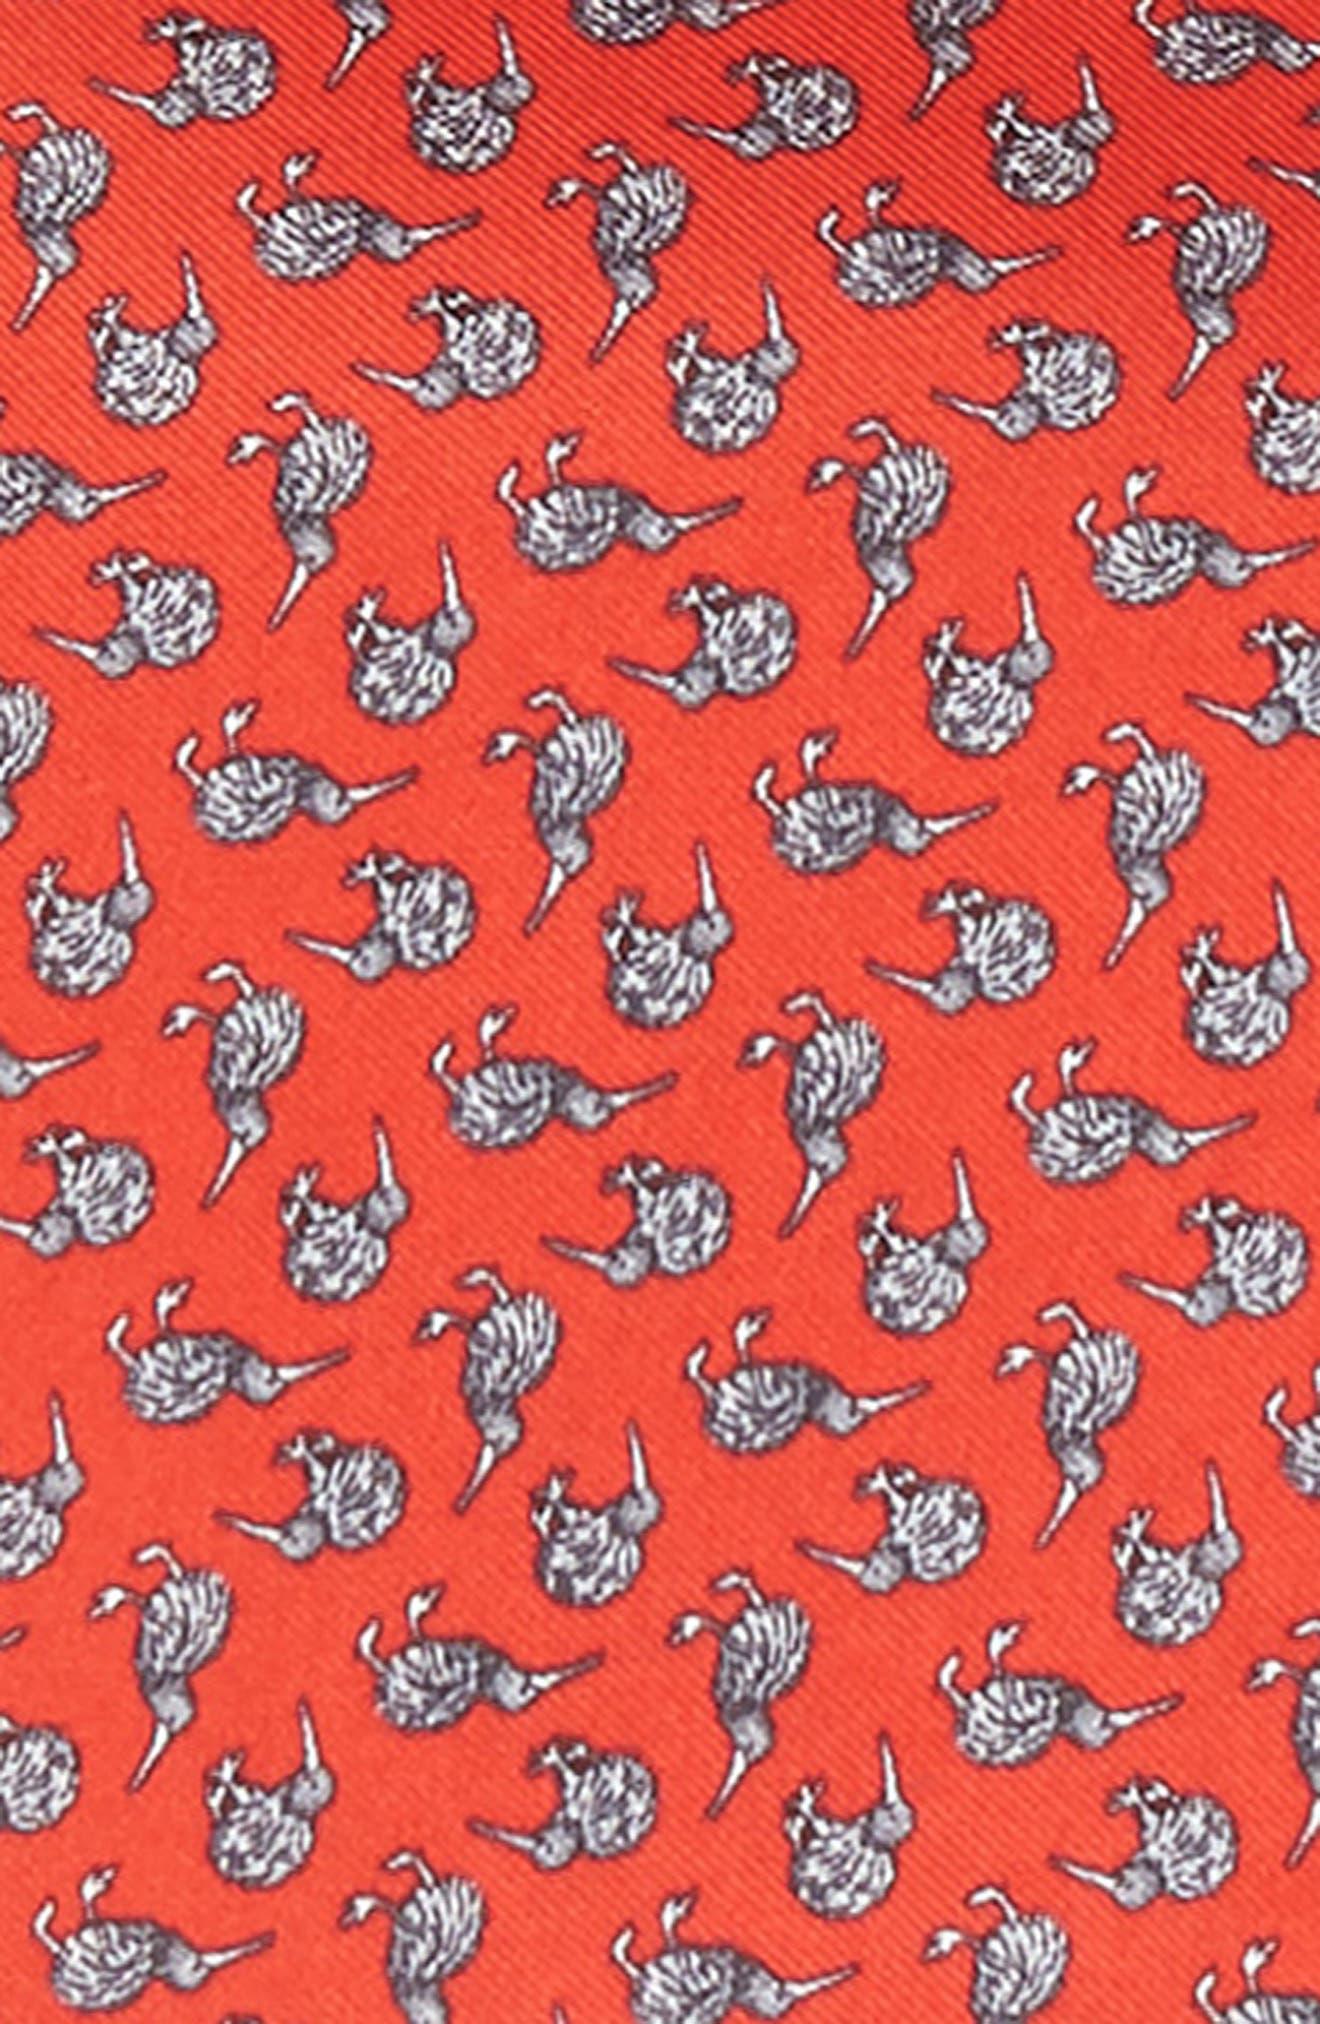 Cheeky Kiwi Silk Pocket Square,                             Alternate thumbnail 3, color,                             620